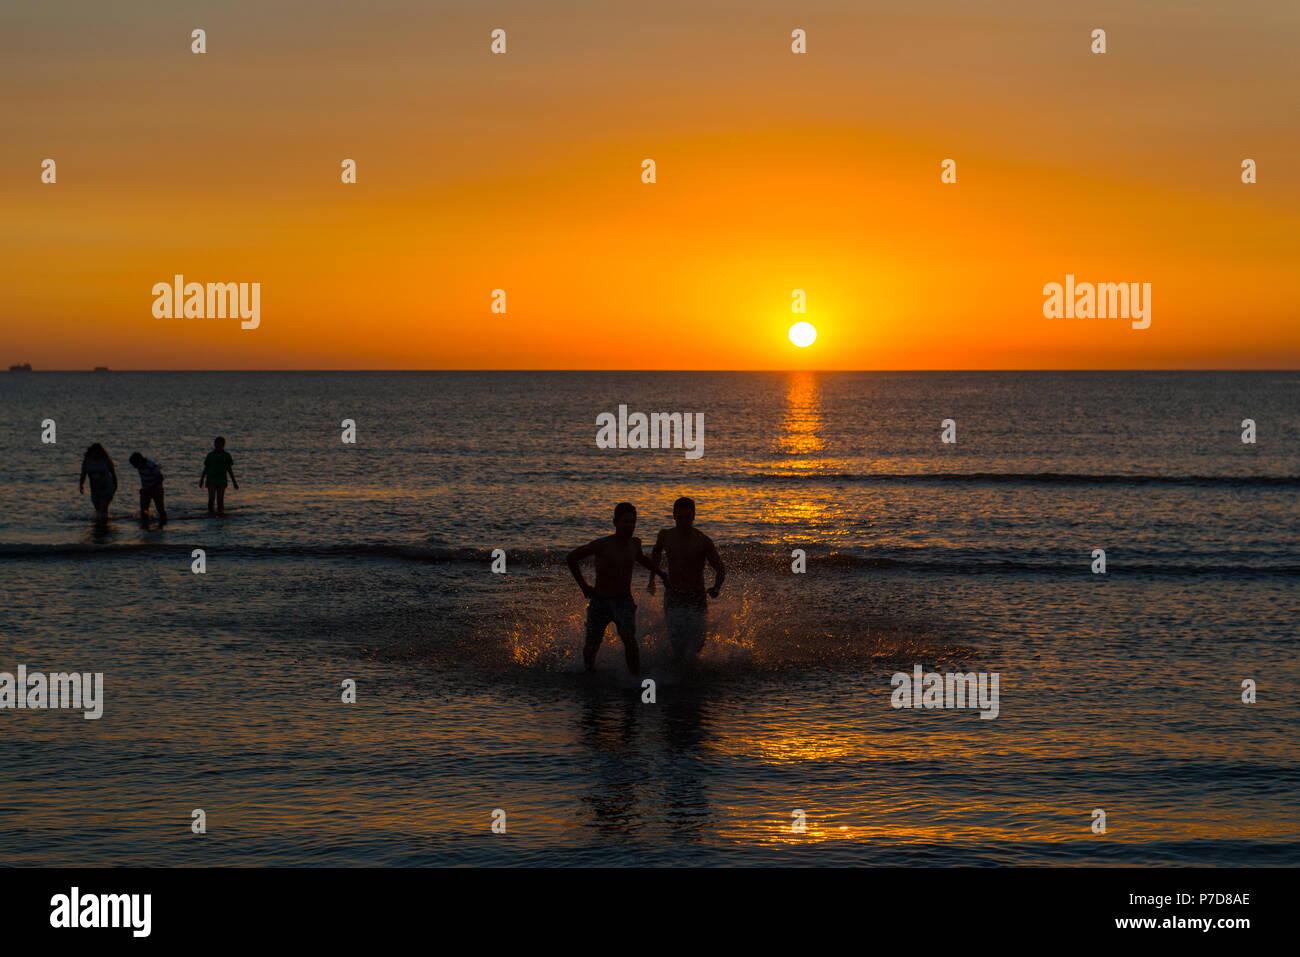 Silhouette, swimmers at sunset at the Rio de la Plata, city beach of Montevideo, Uruguay - Stock Image